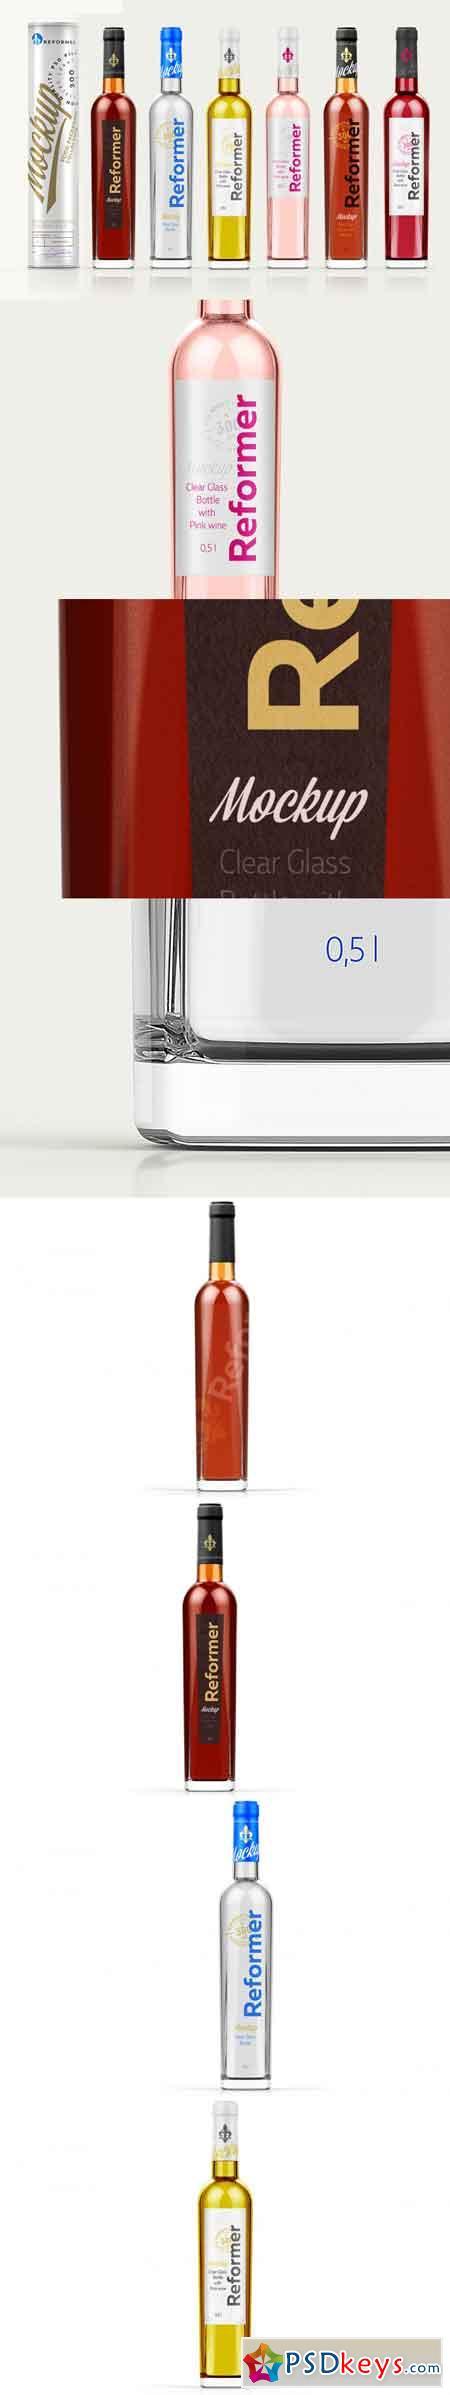 Mockup Cardboard Tube & 6 Bottles 0,5l 3515616